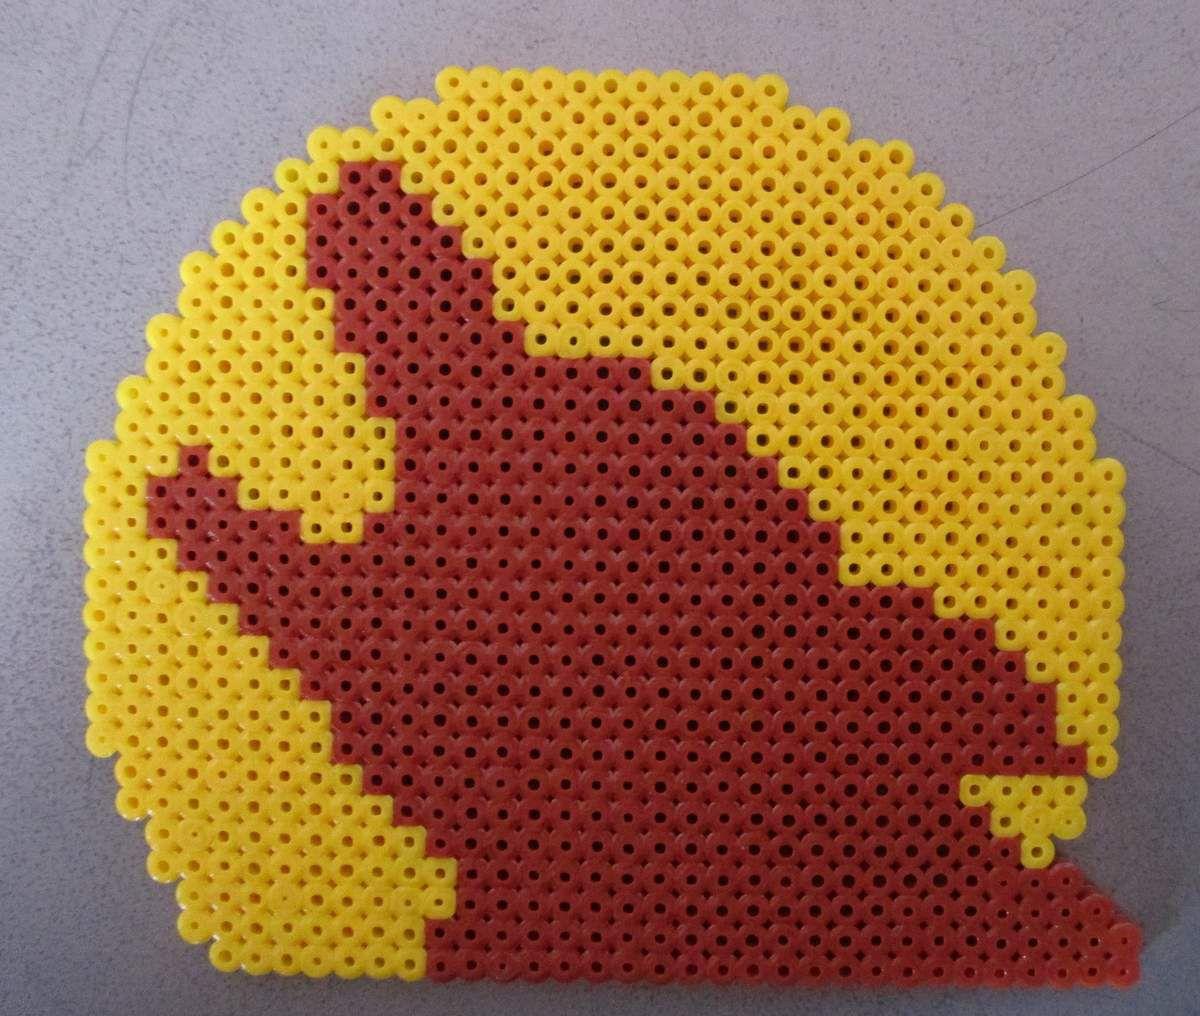 Loup En Perler Beads Pixel Art En Perle à Repasser